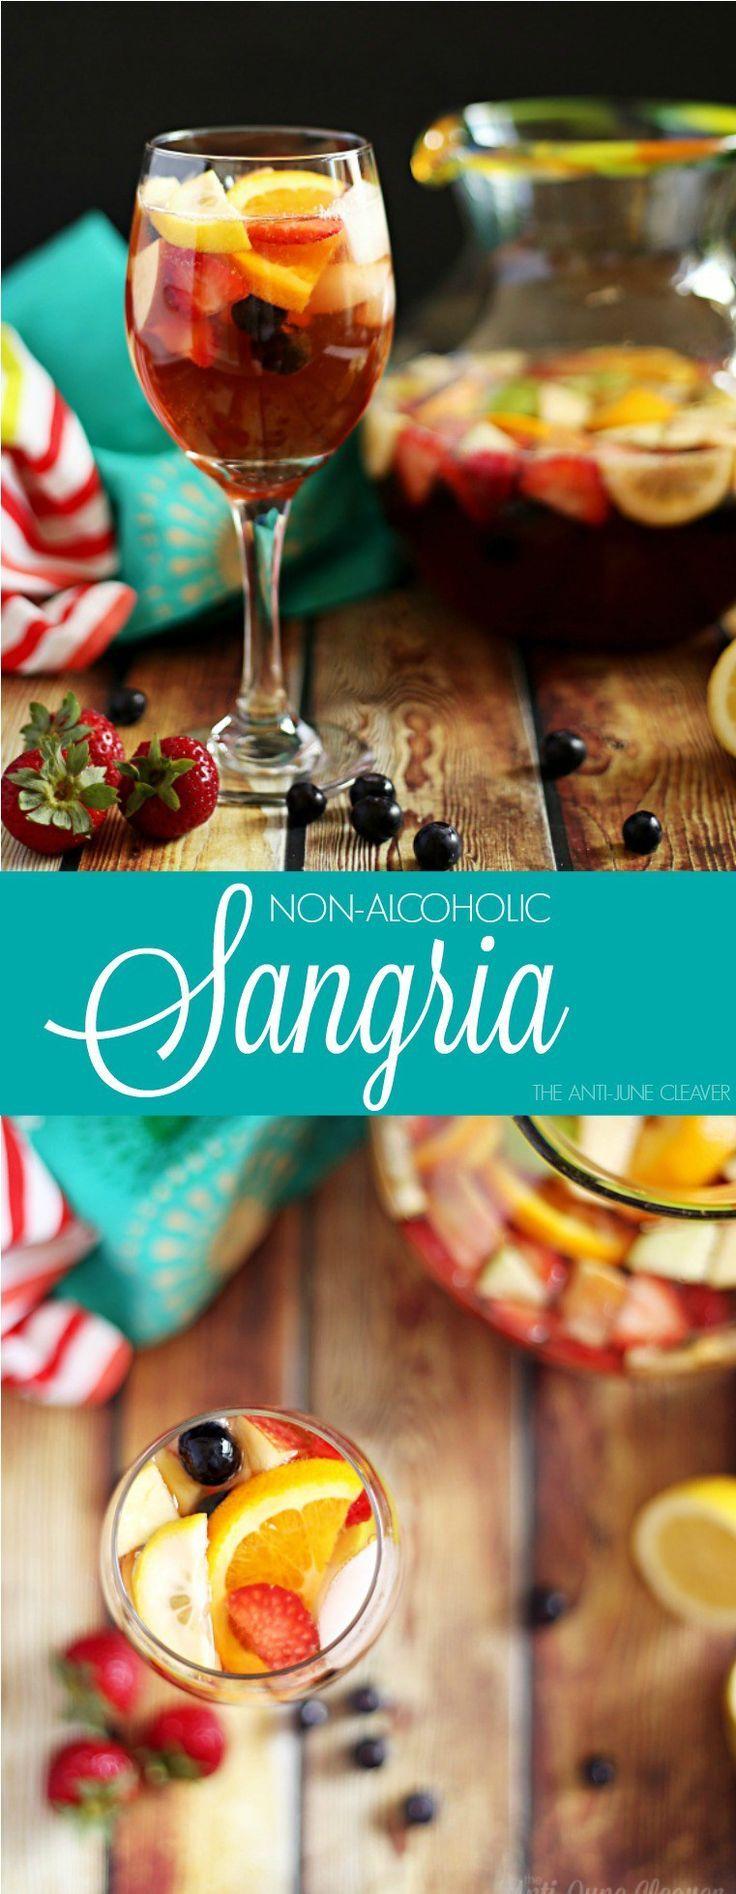 NonAlcoholic Sangria Recipe Non alcoholic sangria